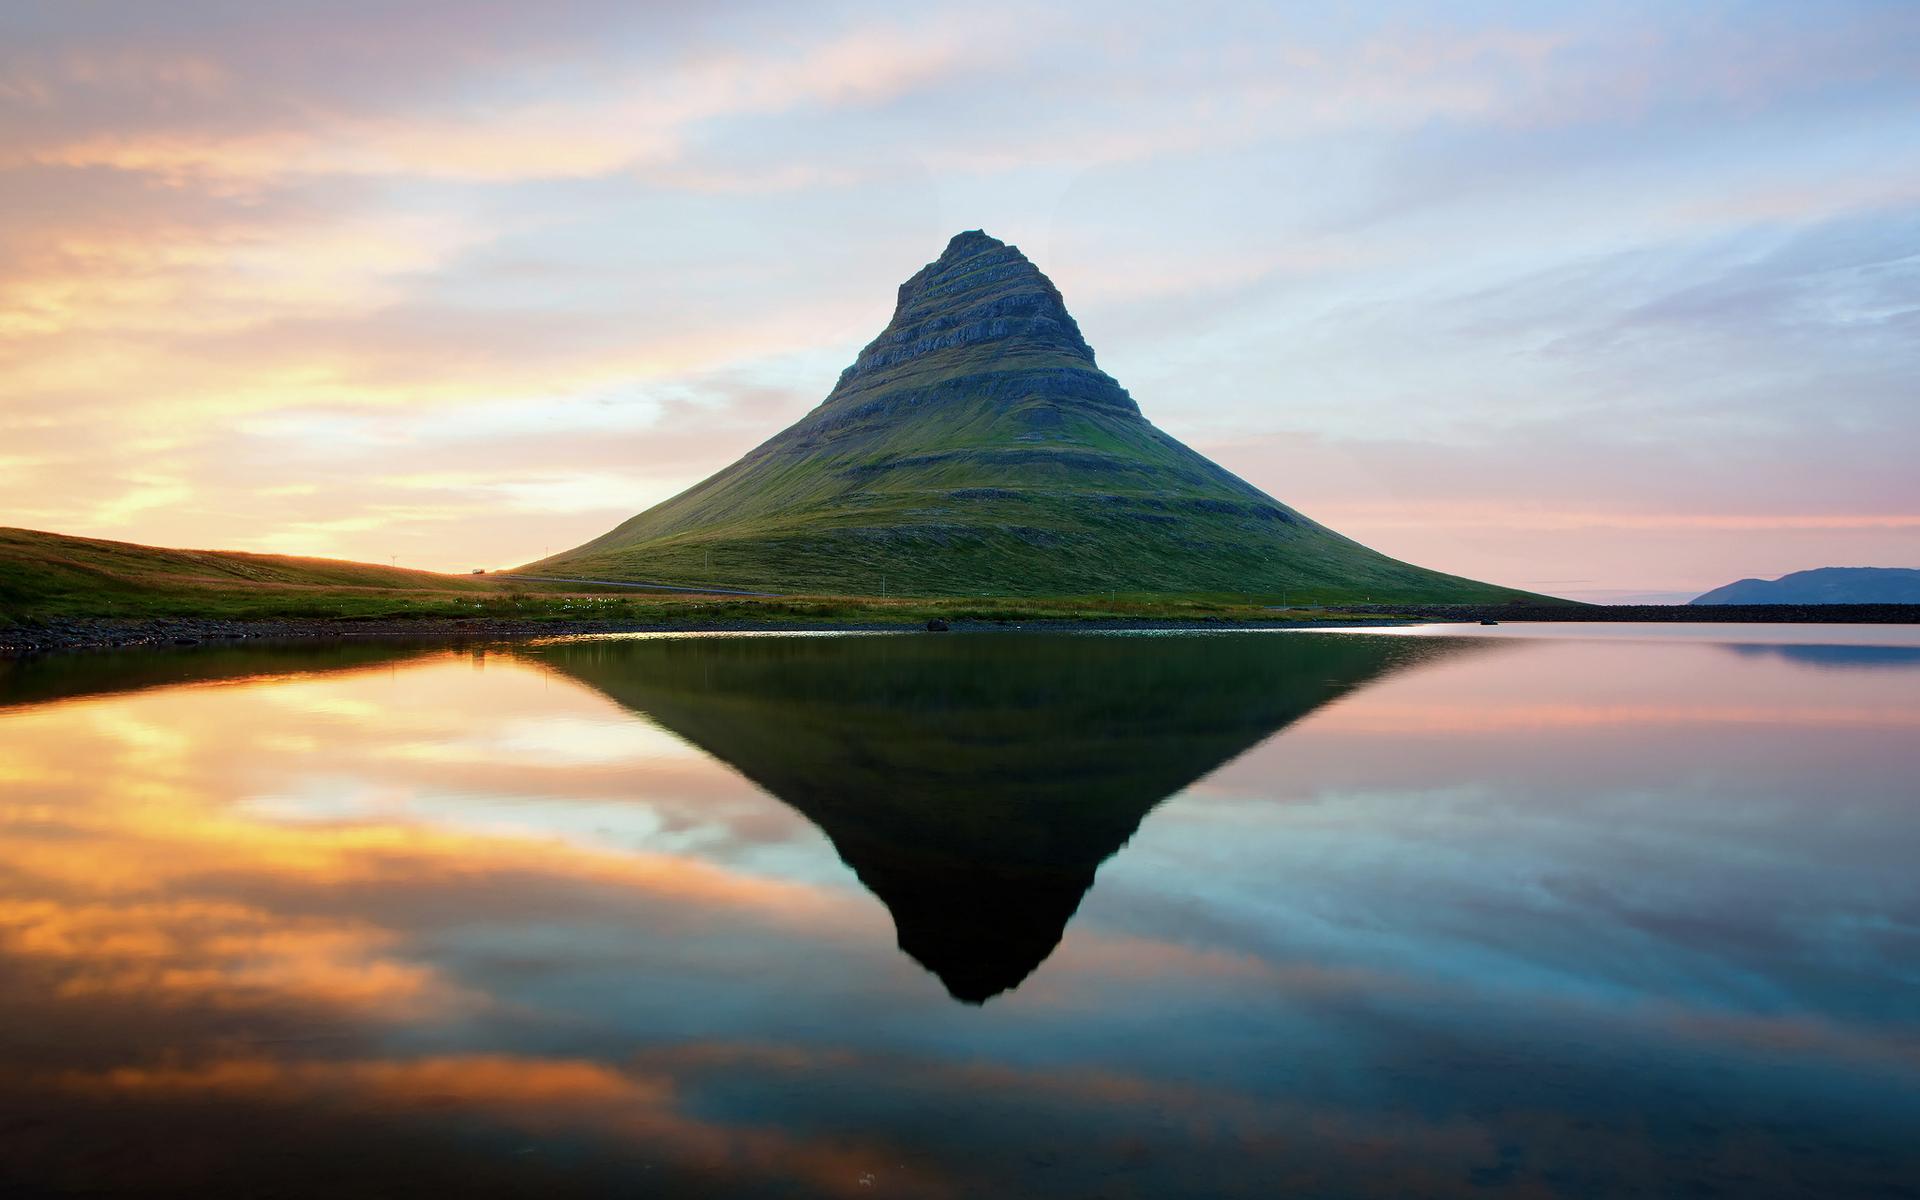 Iceland Volcano Landscape   Desktop Wallpaper 1920x1200